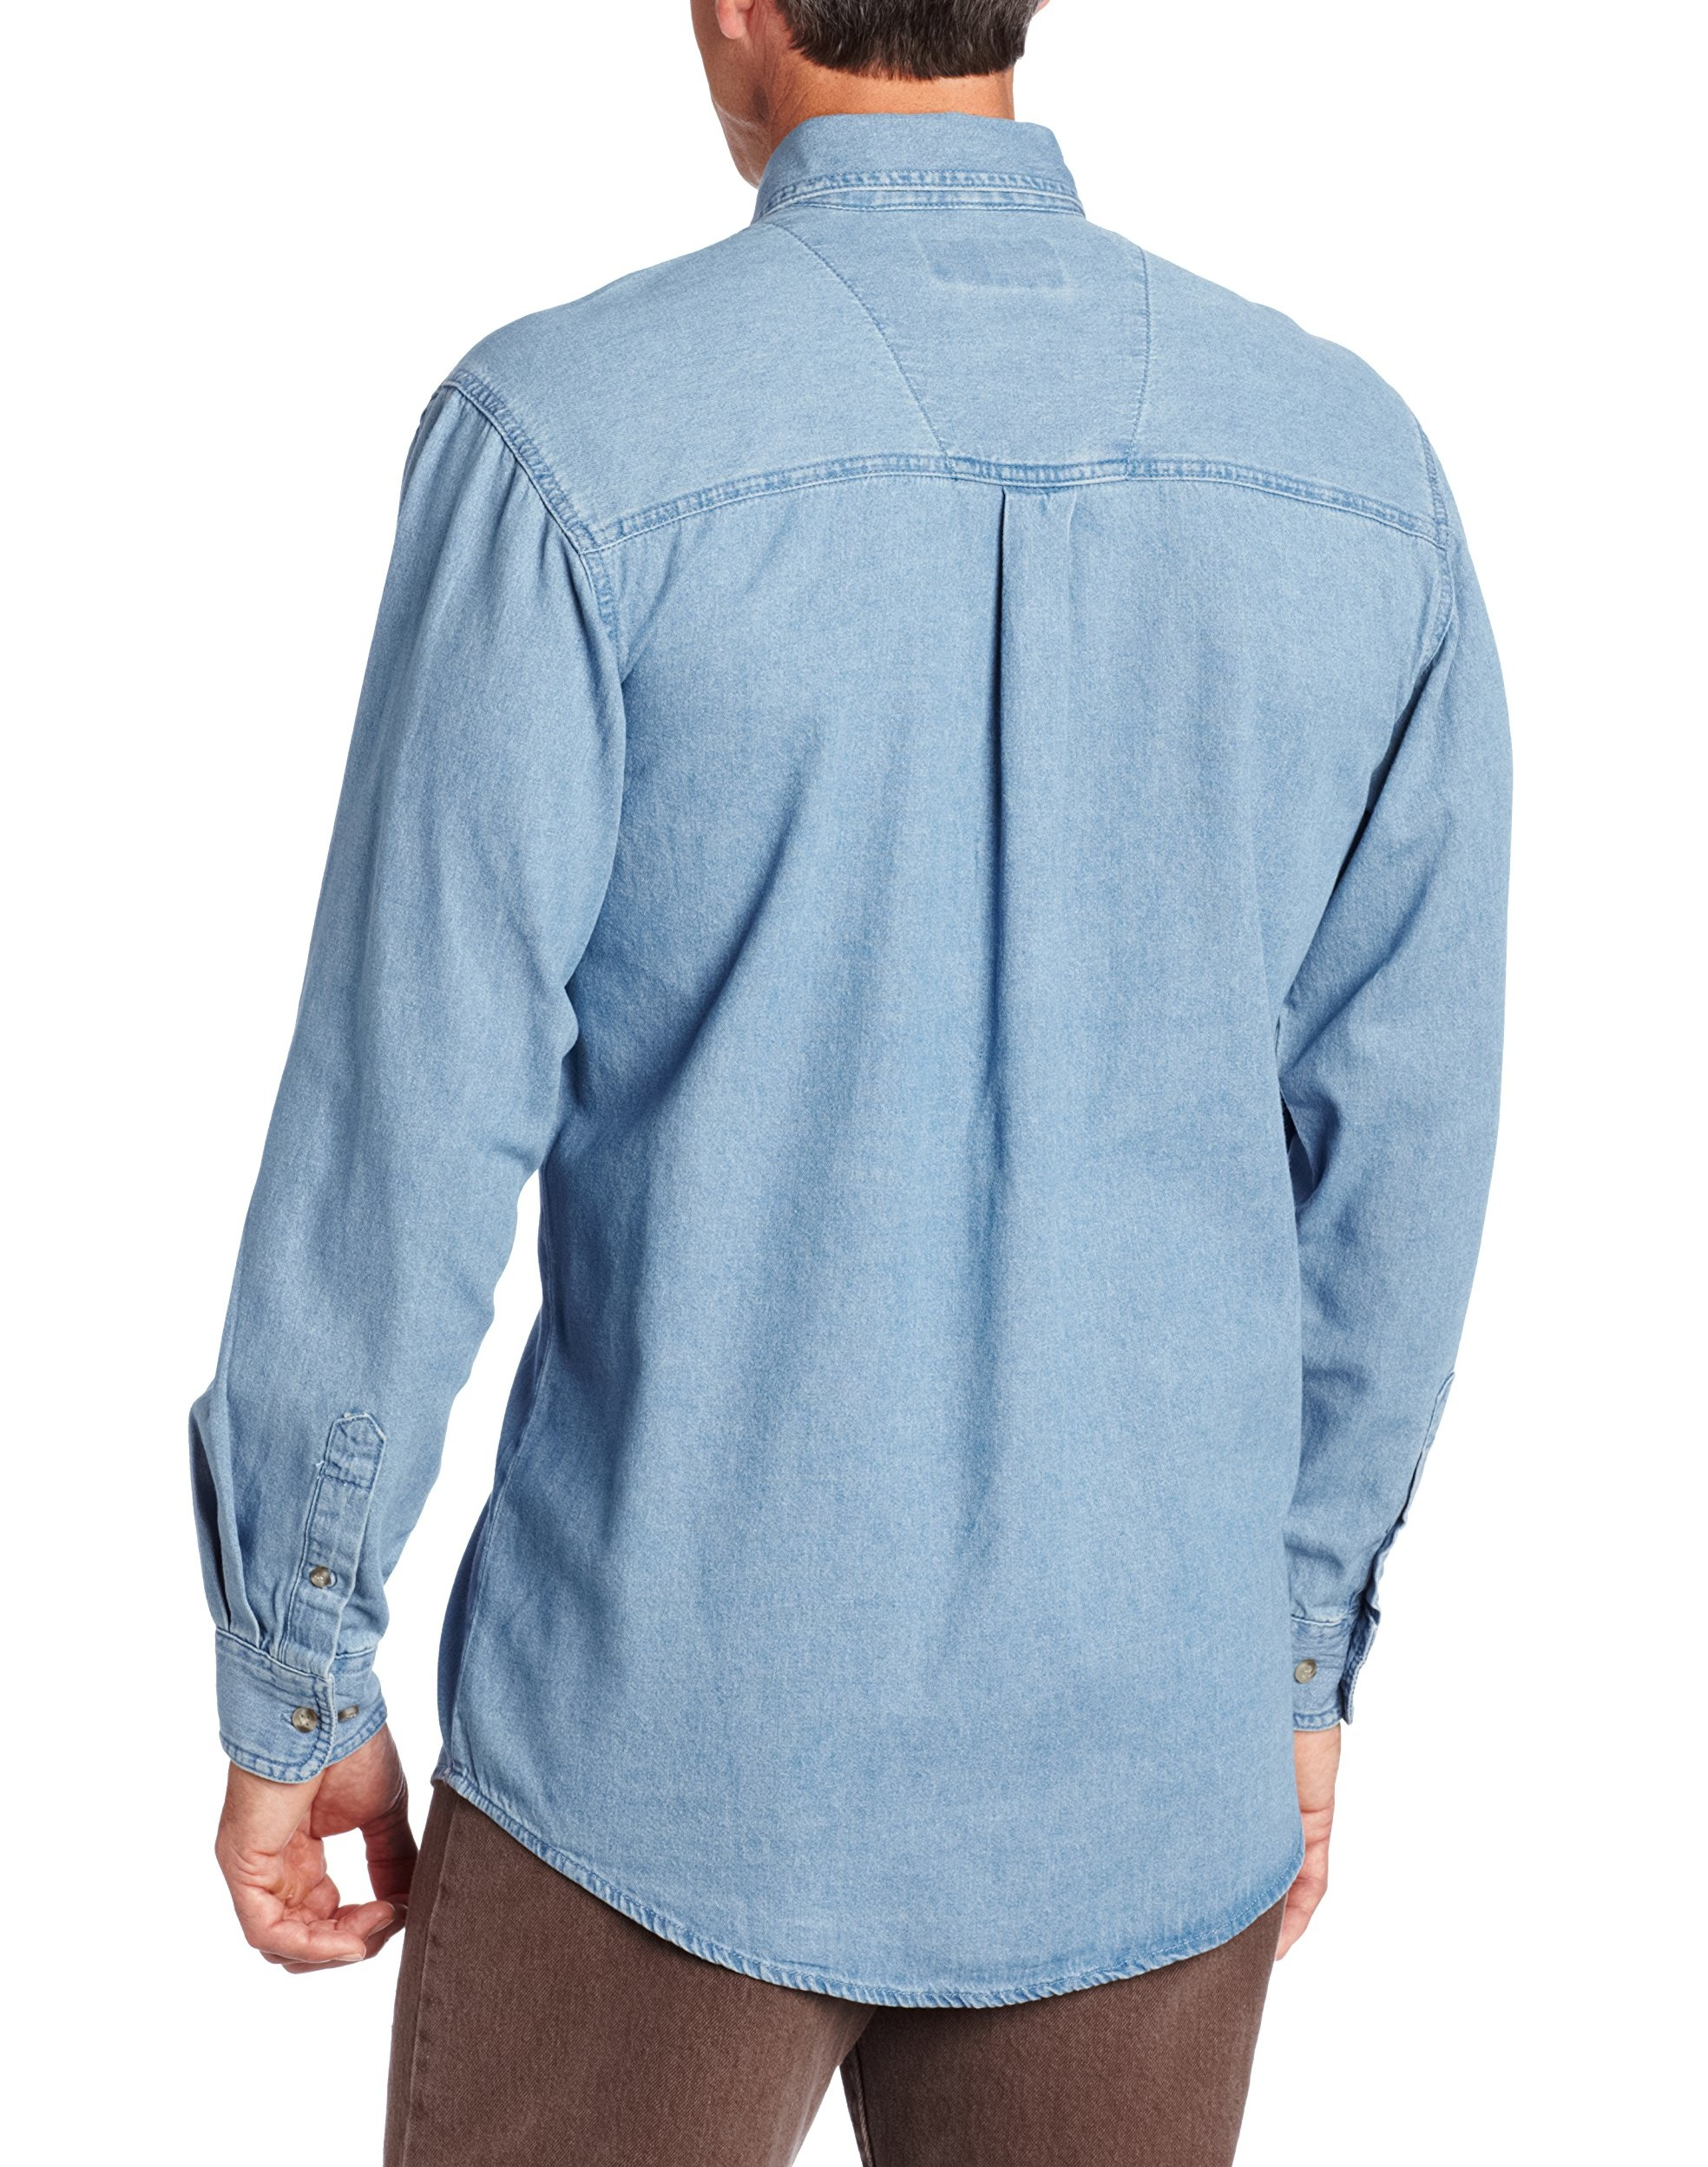 M White WRANGLER Mens FINE DETAL EMBROIDERY Shirt